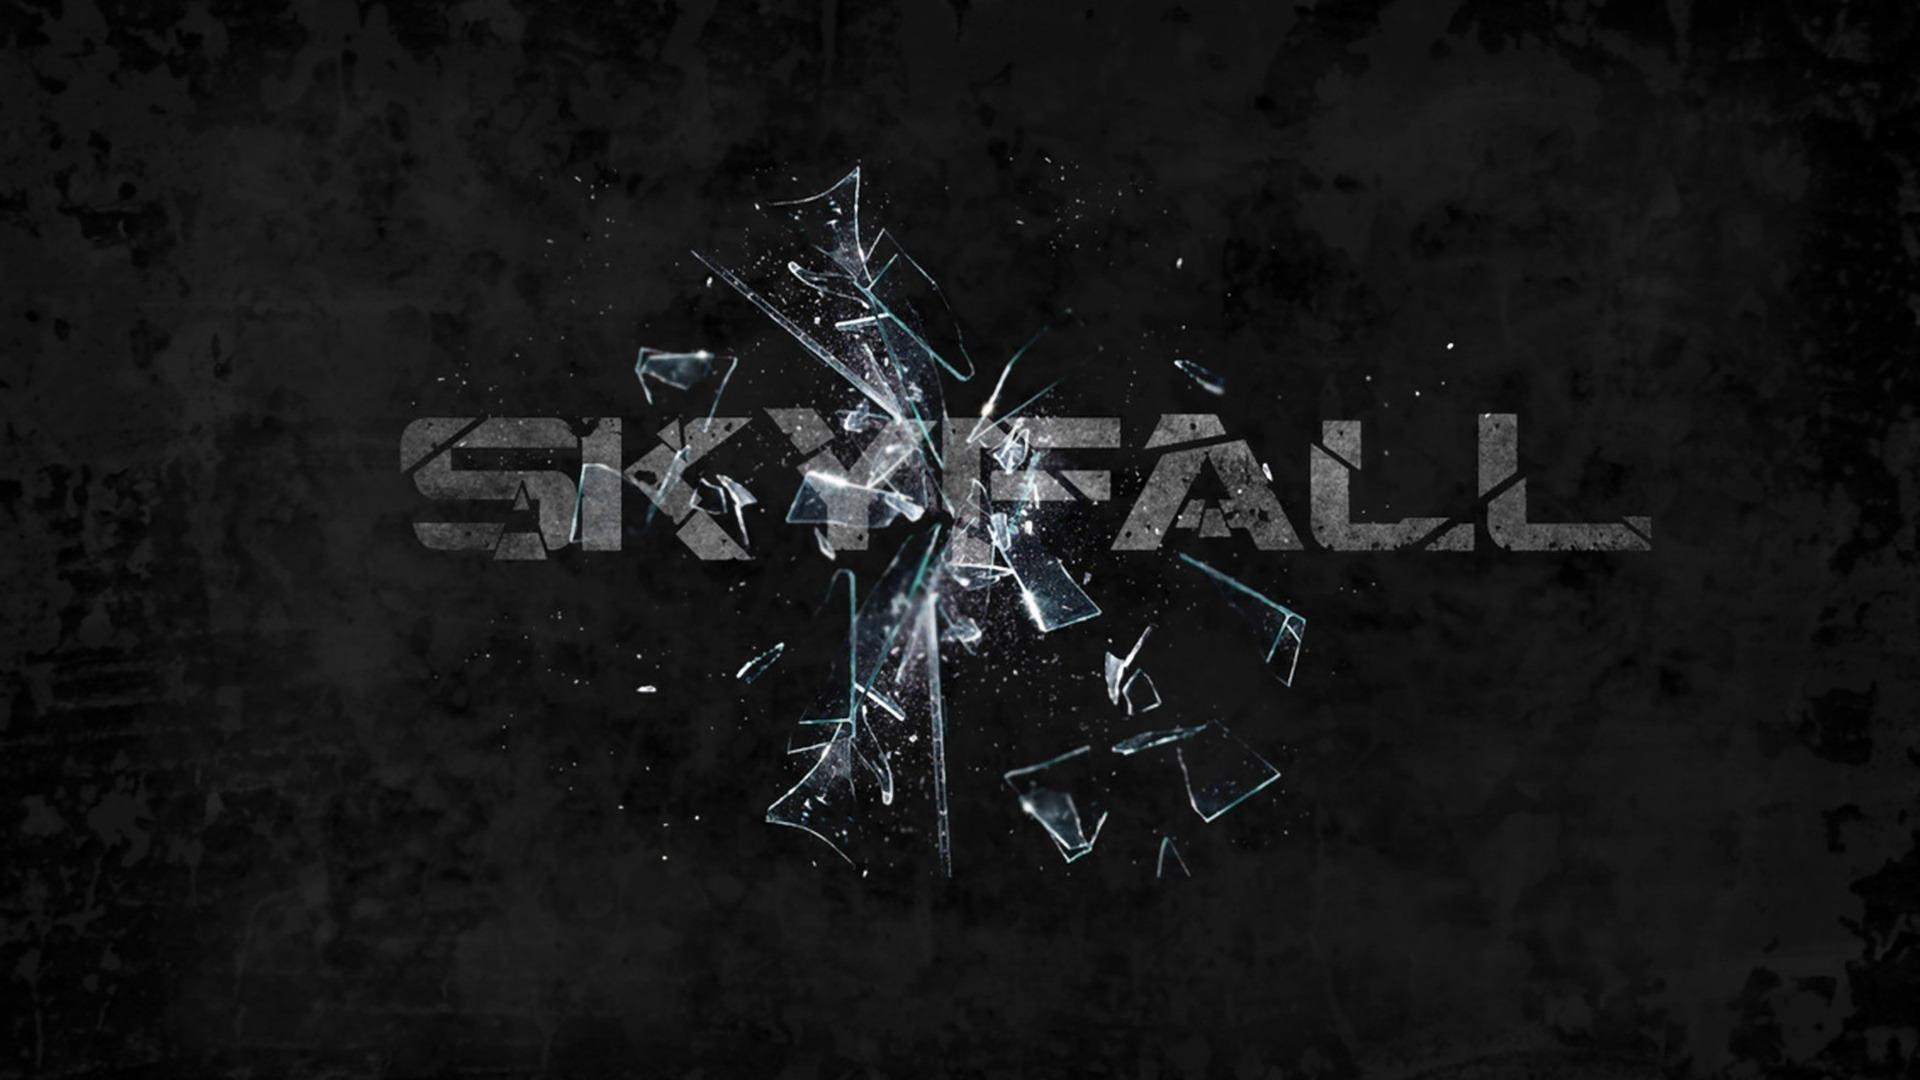 007 Skyfall 12 ムービーのhdデスクトップの壁紙プレビュー 10wallpaper Com